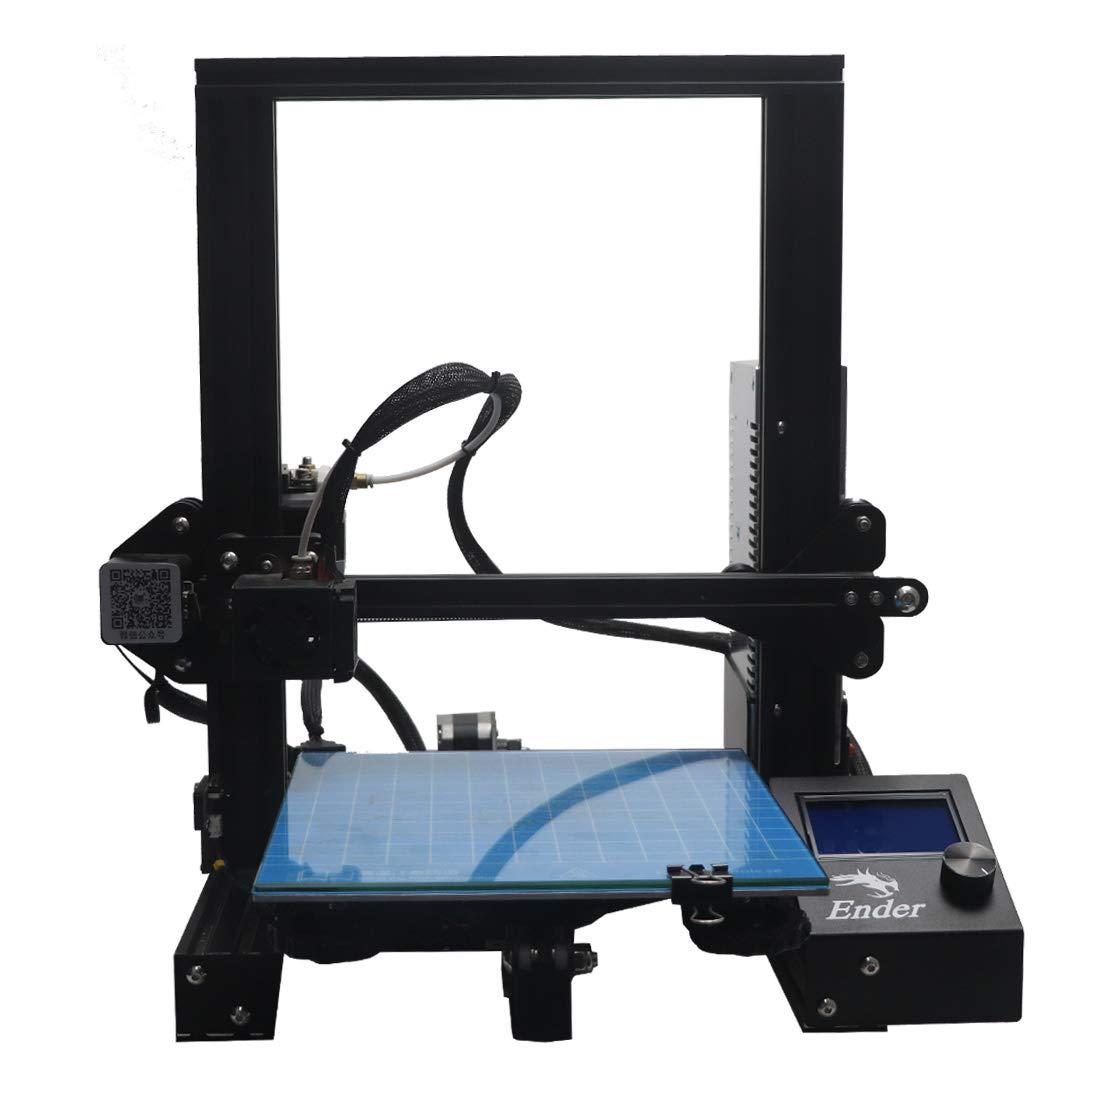 Glass Printer Bed 235x235x4.0mm Borosilicate Glass 3D